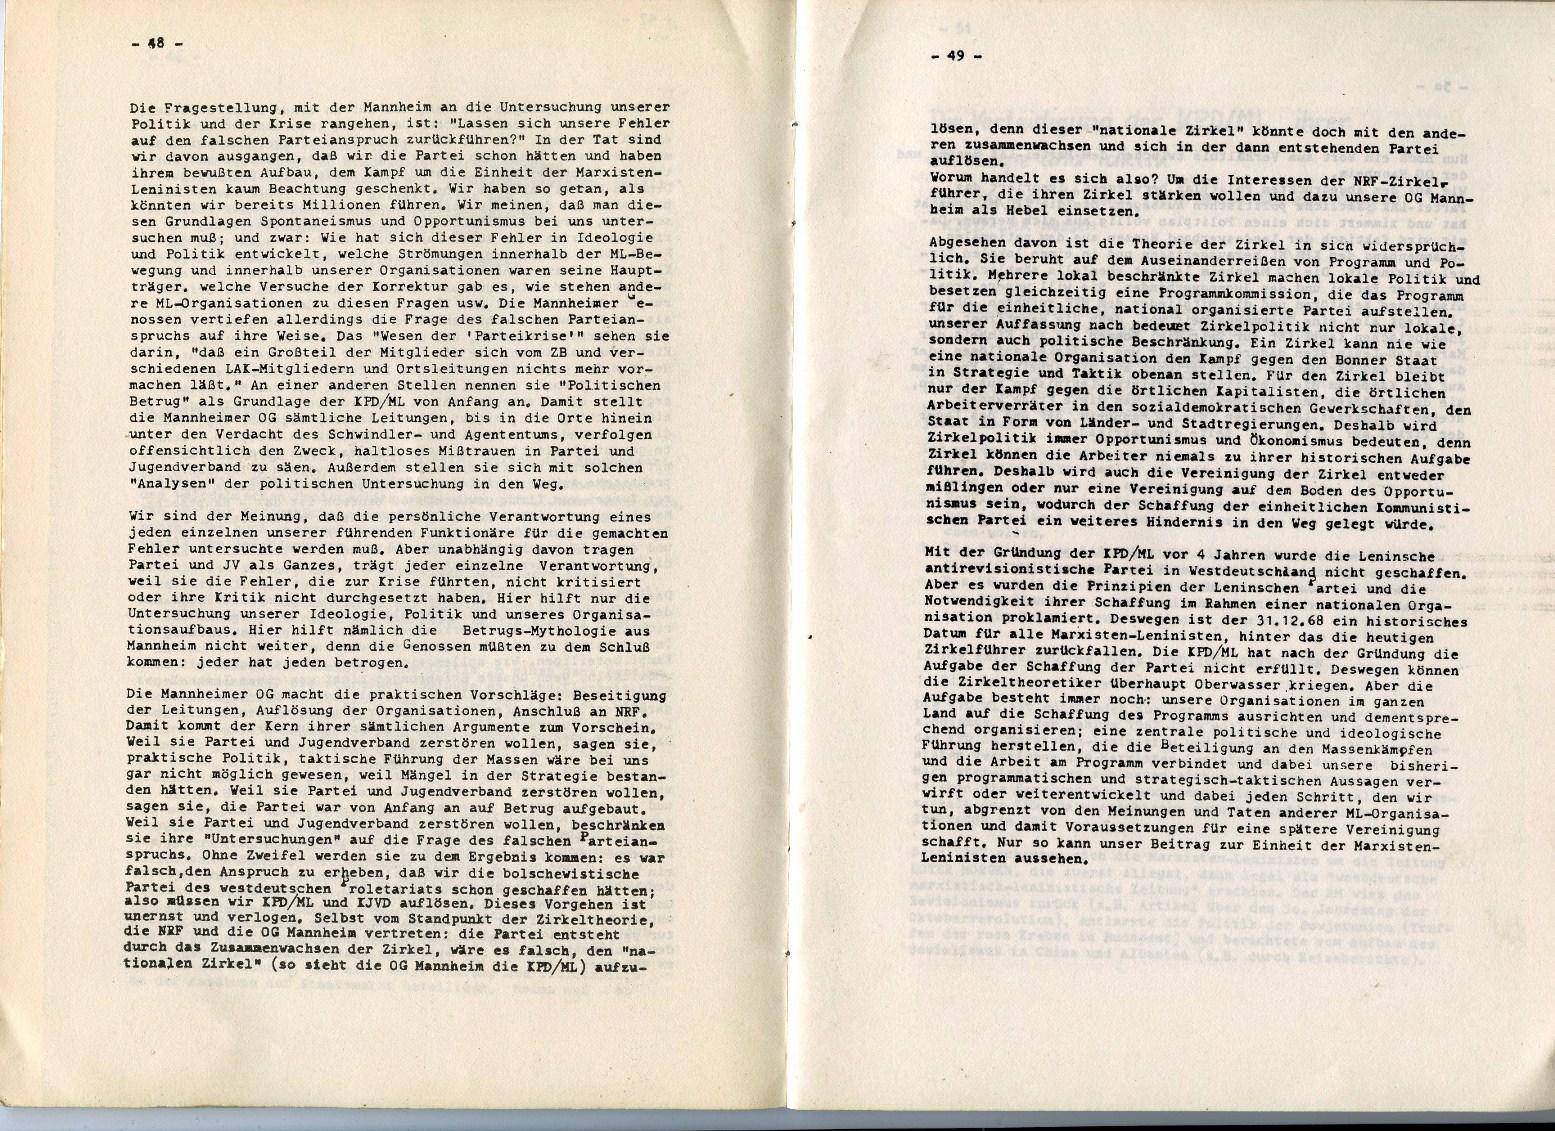 ZB_Universitas_1972_28